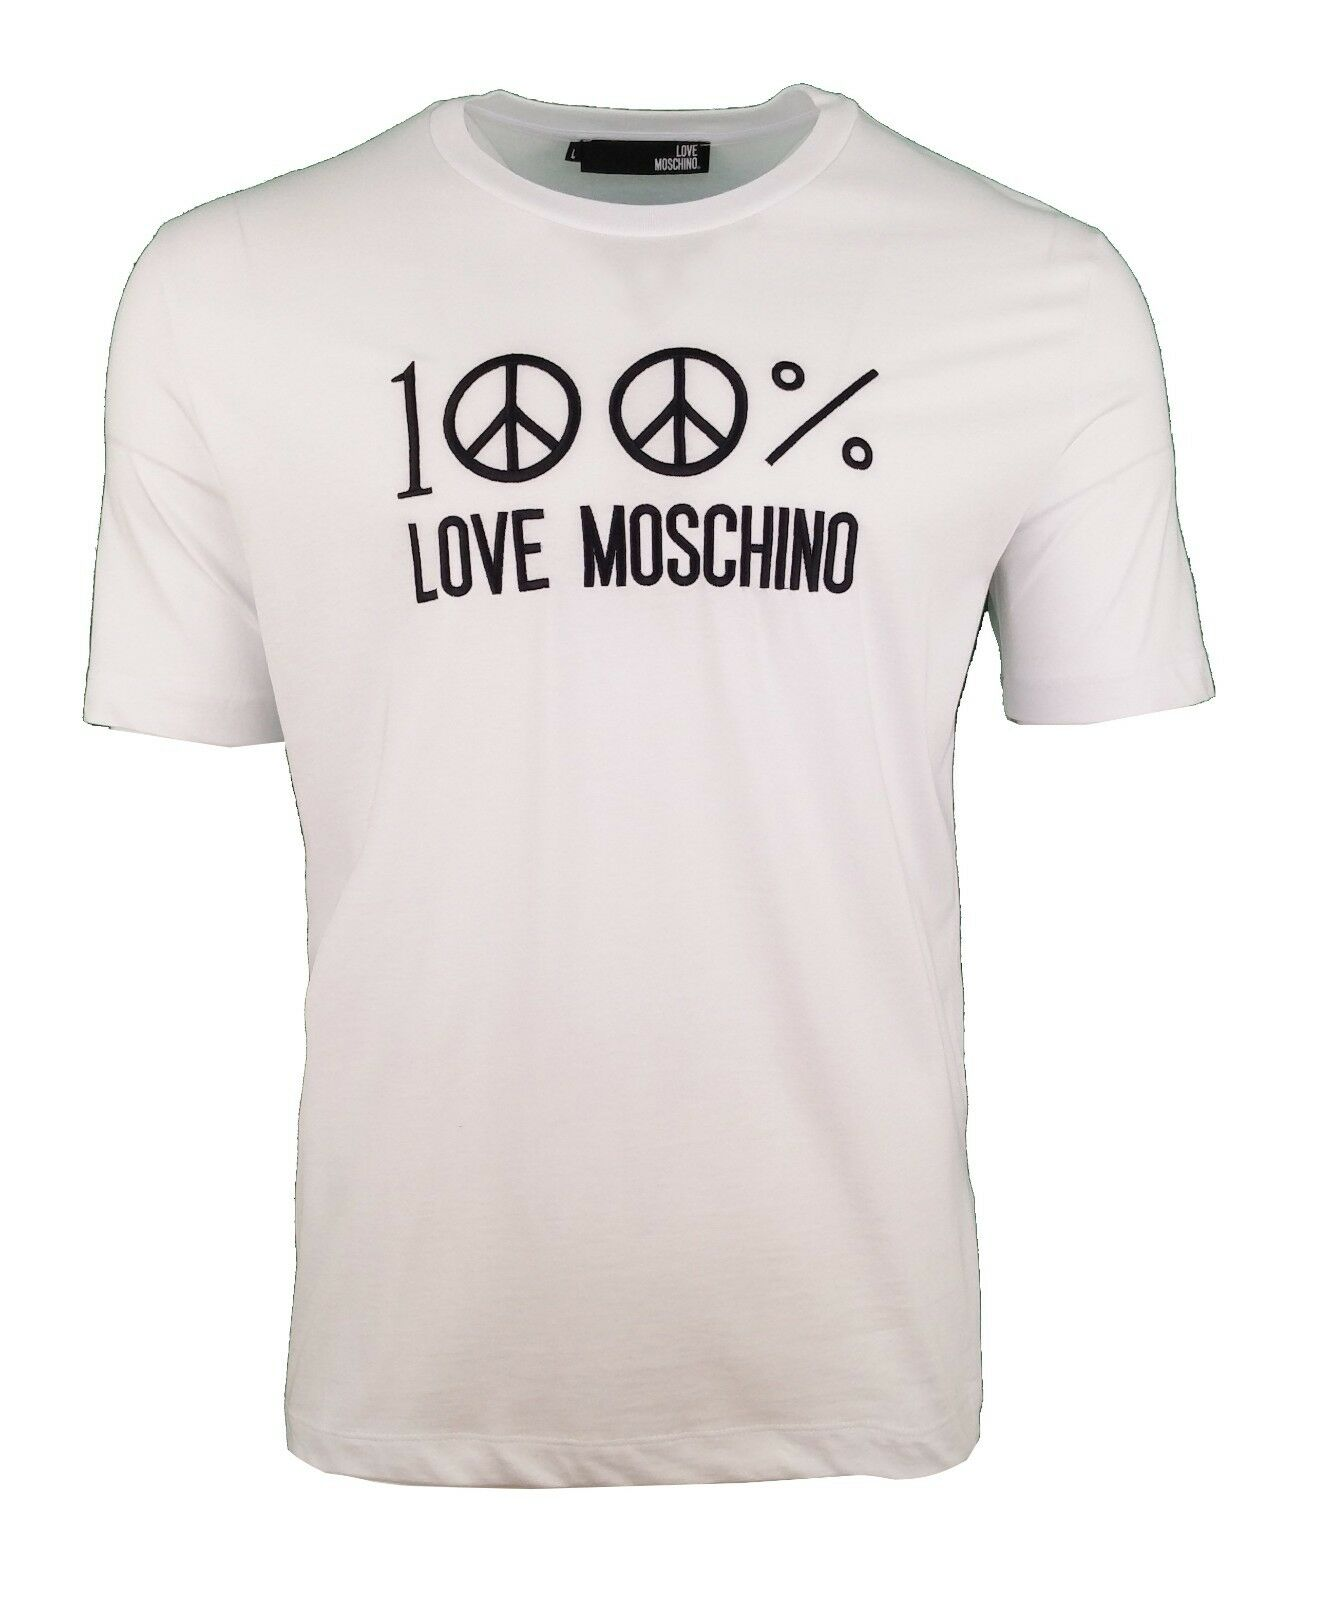 LOVE MOSCHINO 100% EMBROIDErot PEACE LOGO T-SHIRT Weiß & schwarz RARE